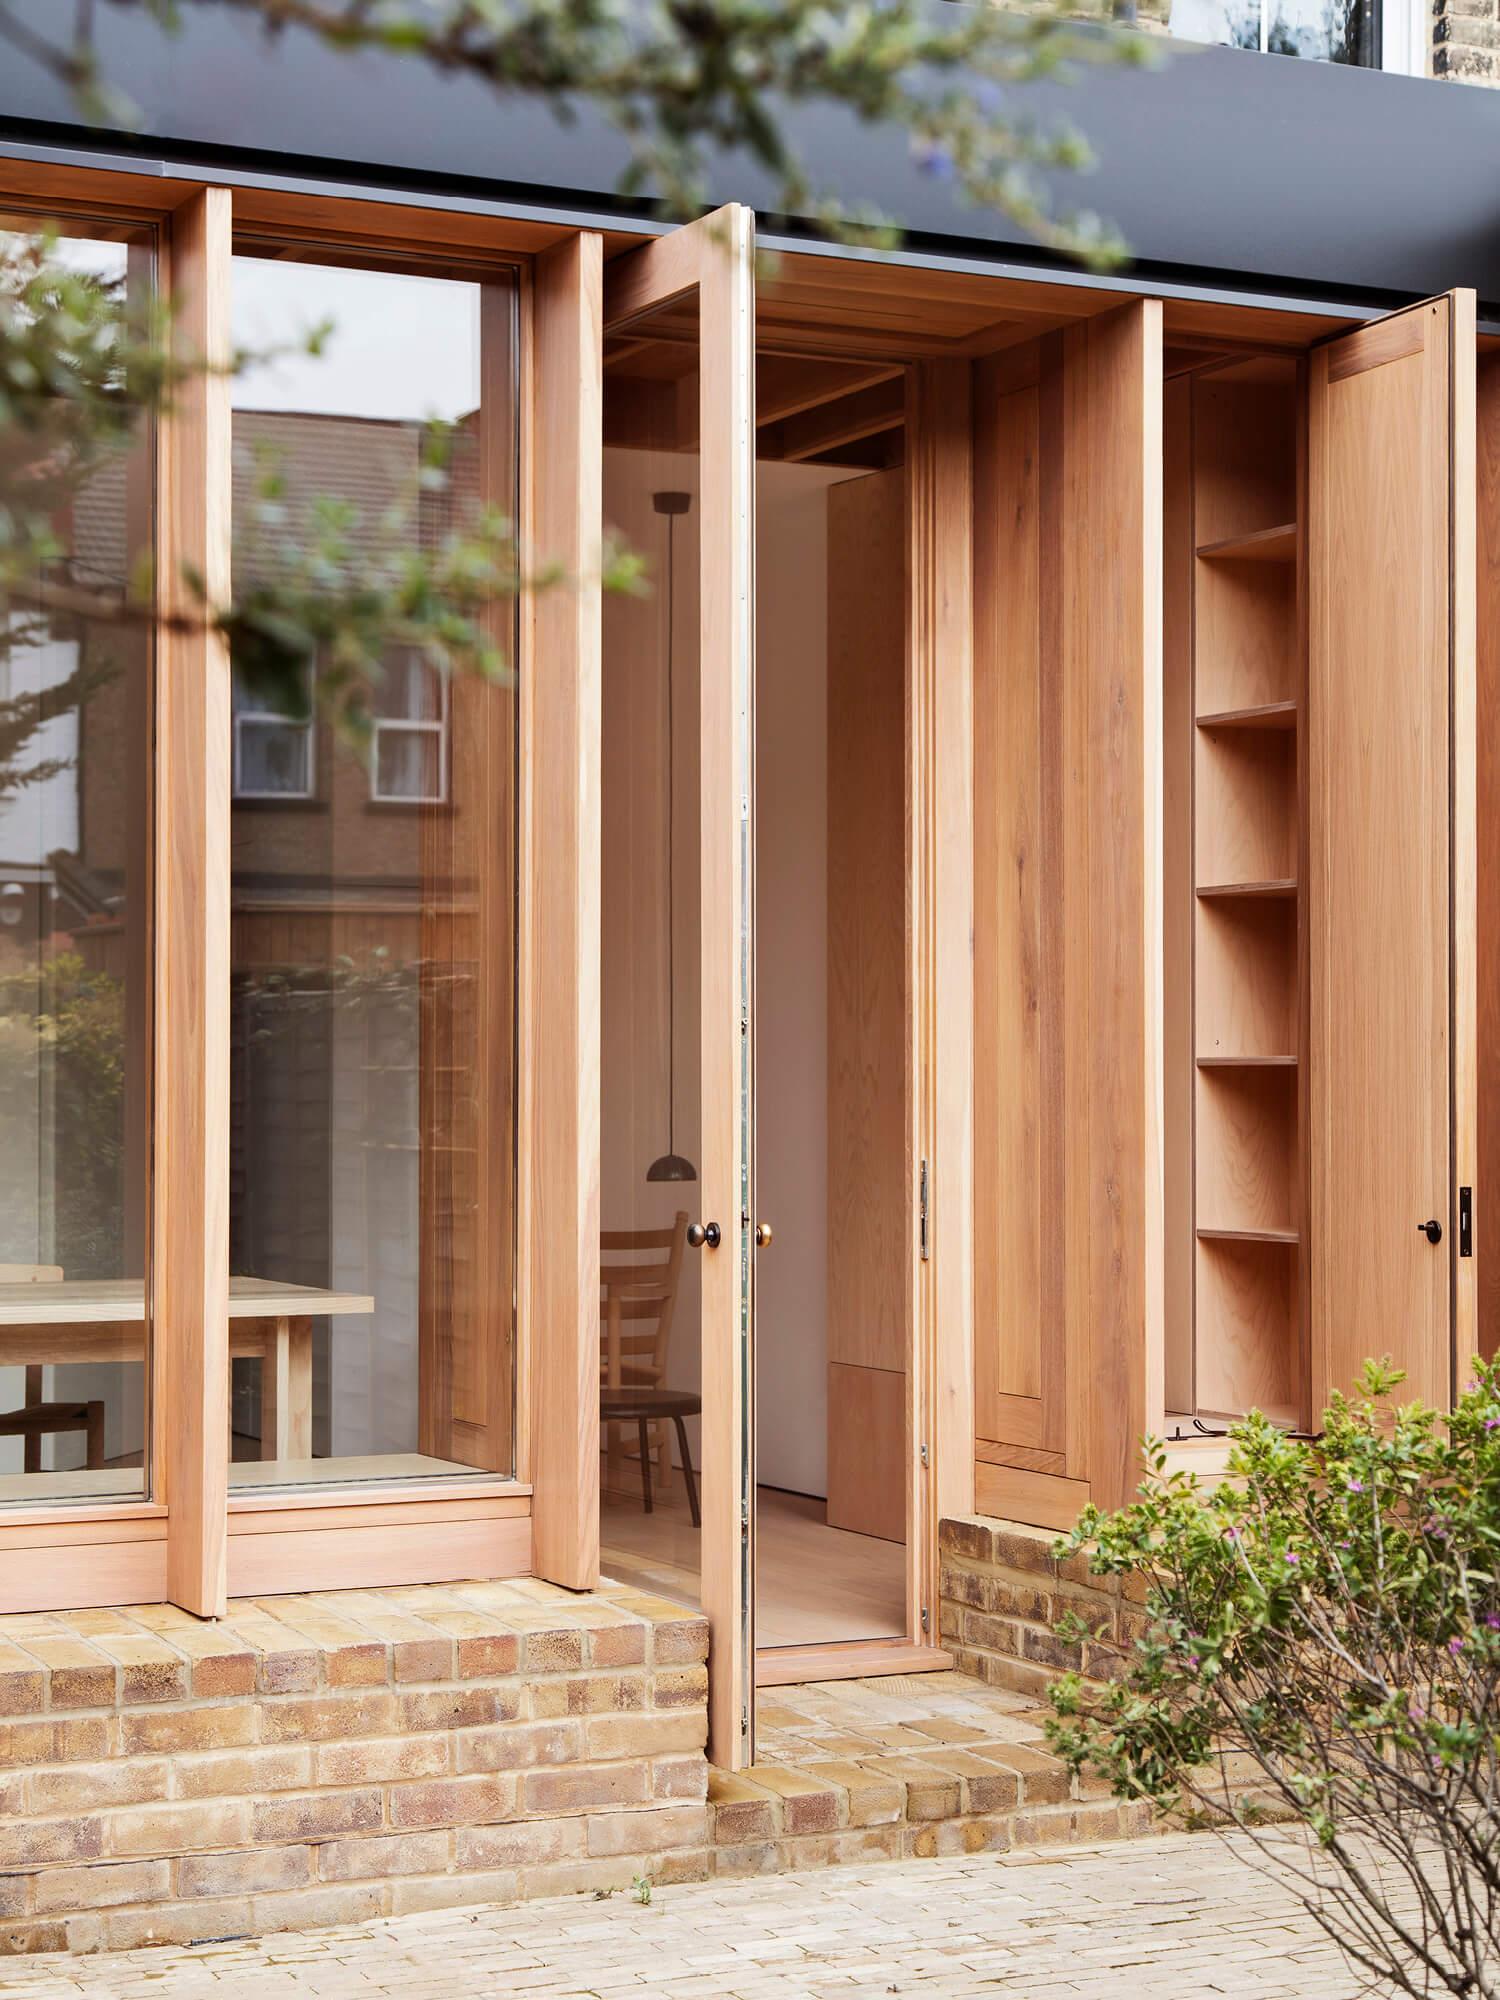 est living dewsbury road o sullivan architects 04